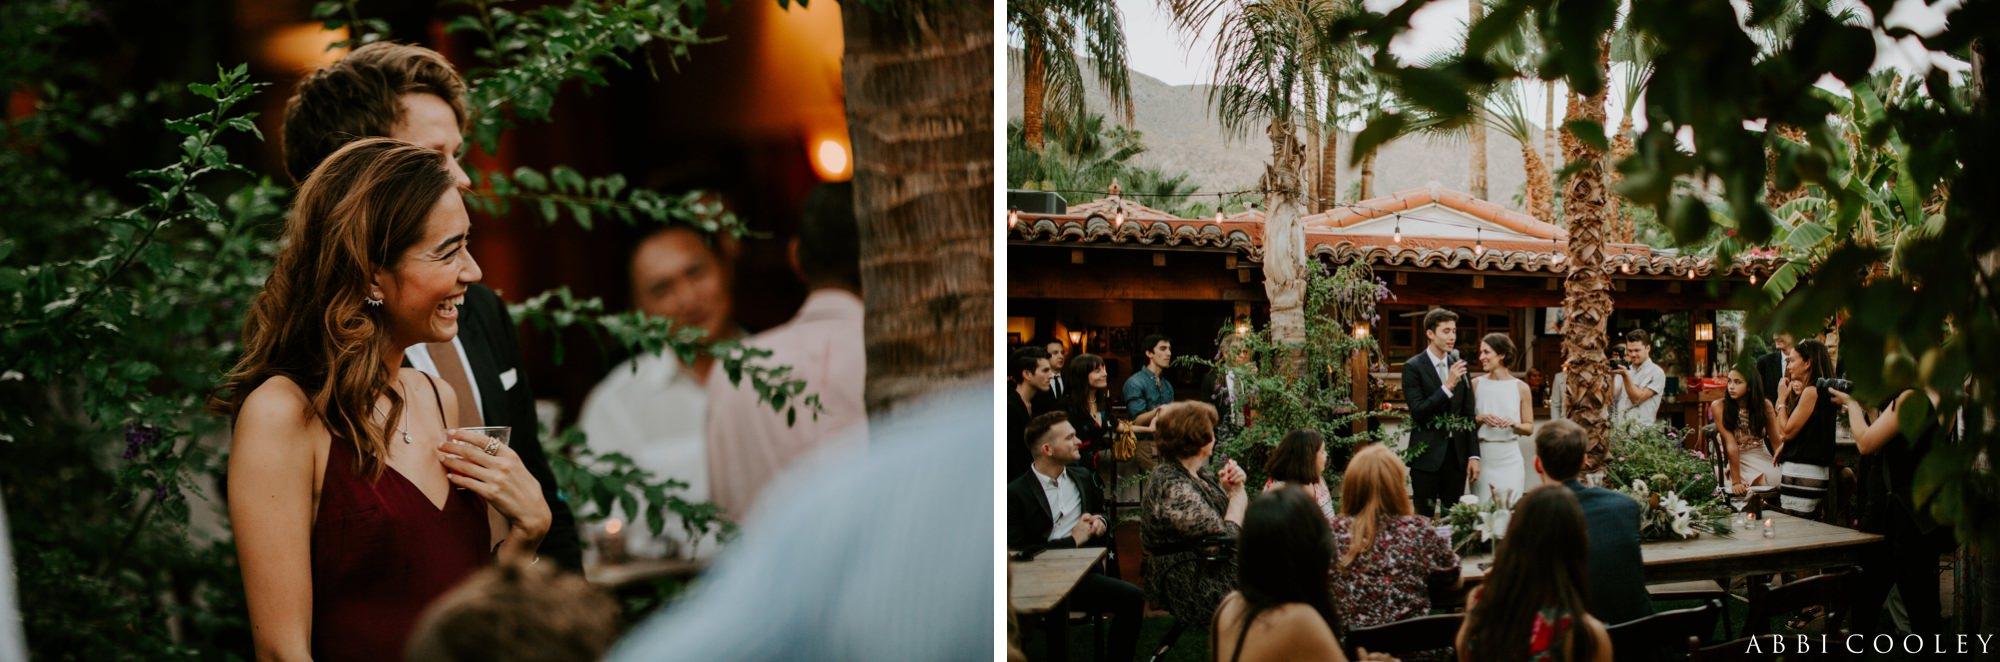 ABBI COOLEY PALM SPRINGS WEDDING_0822